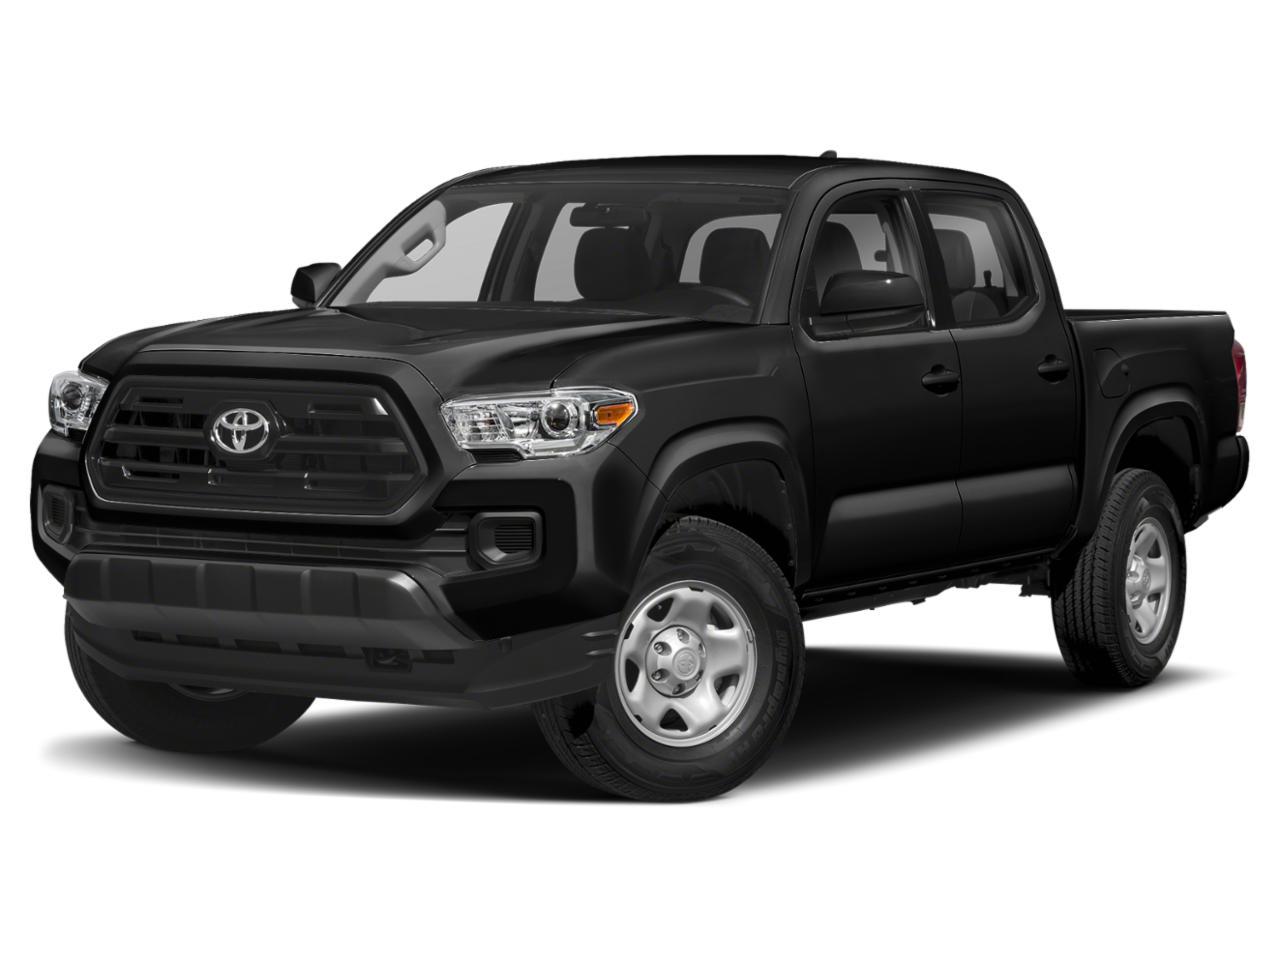 2018 Toyota Tacoma Vehicle Photo in Kernersville, NC 27284